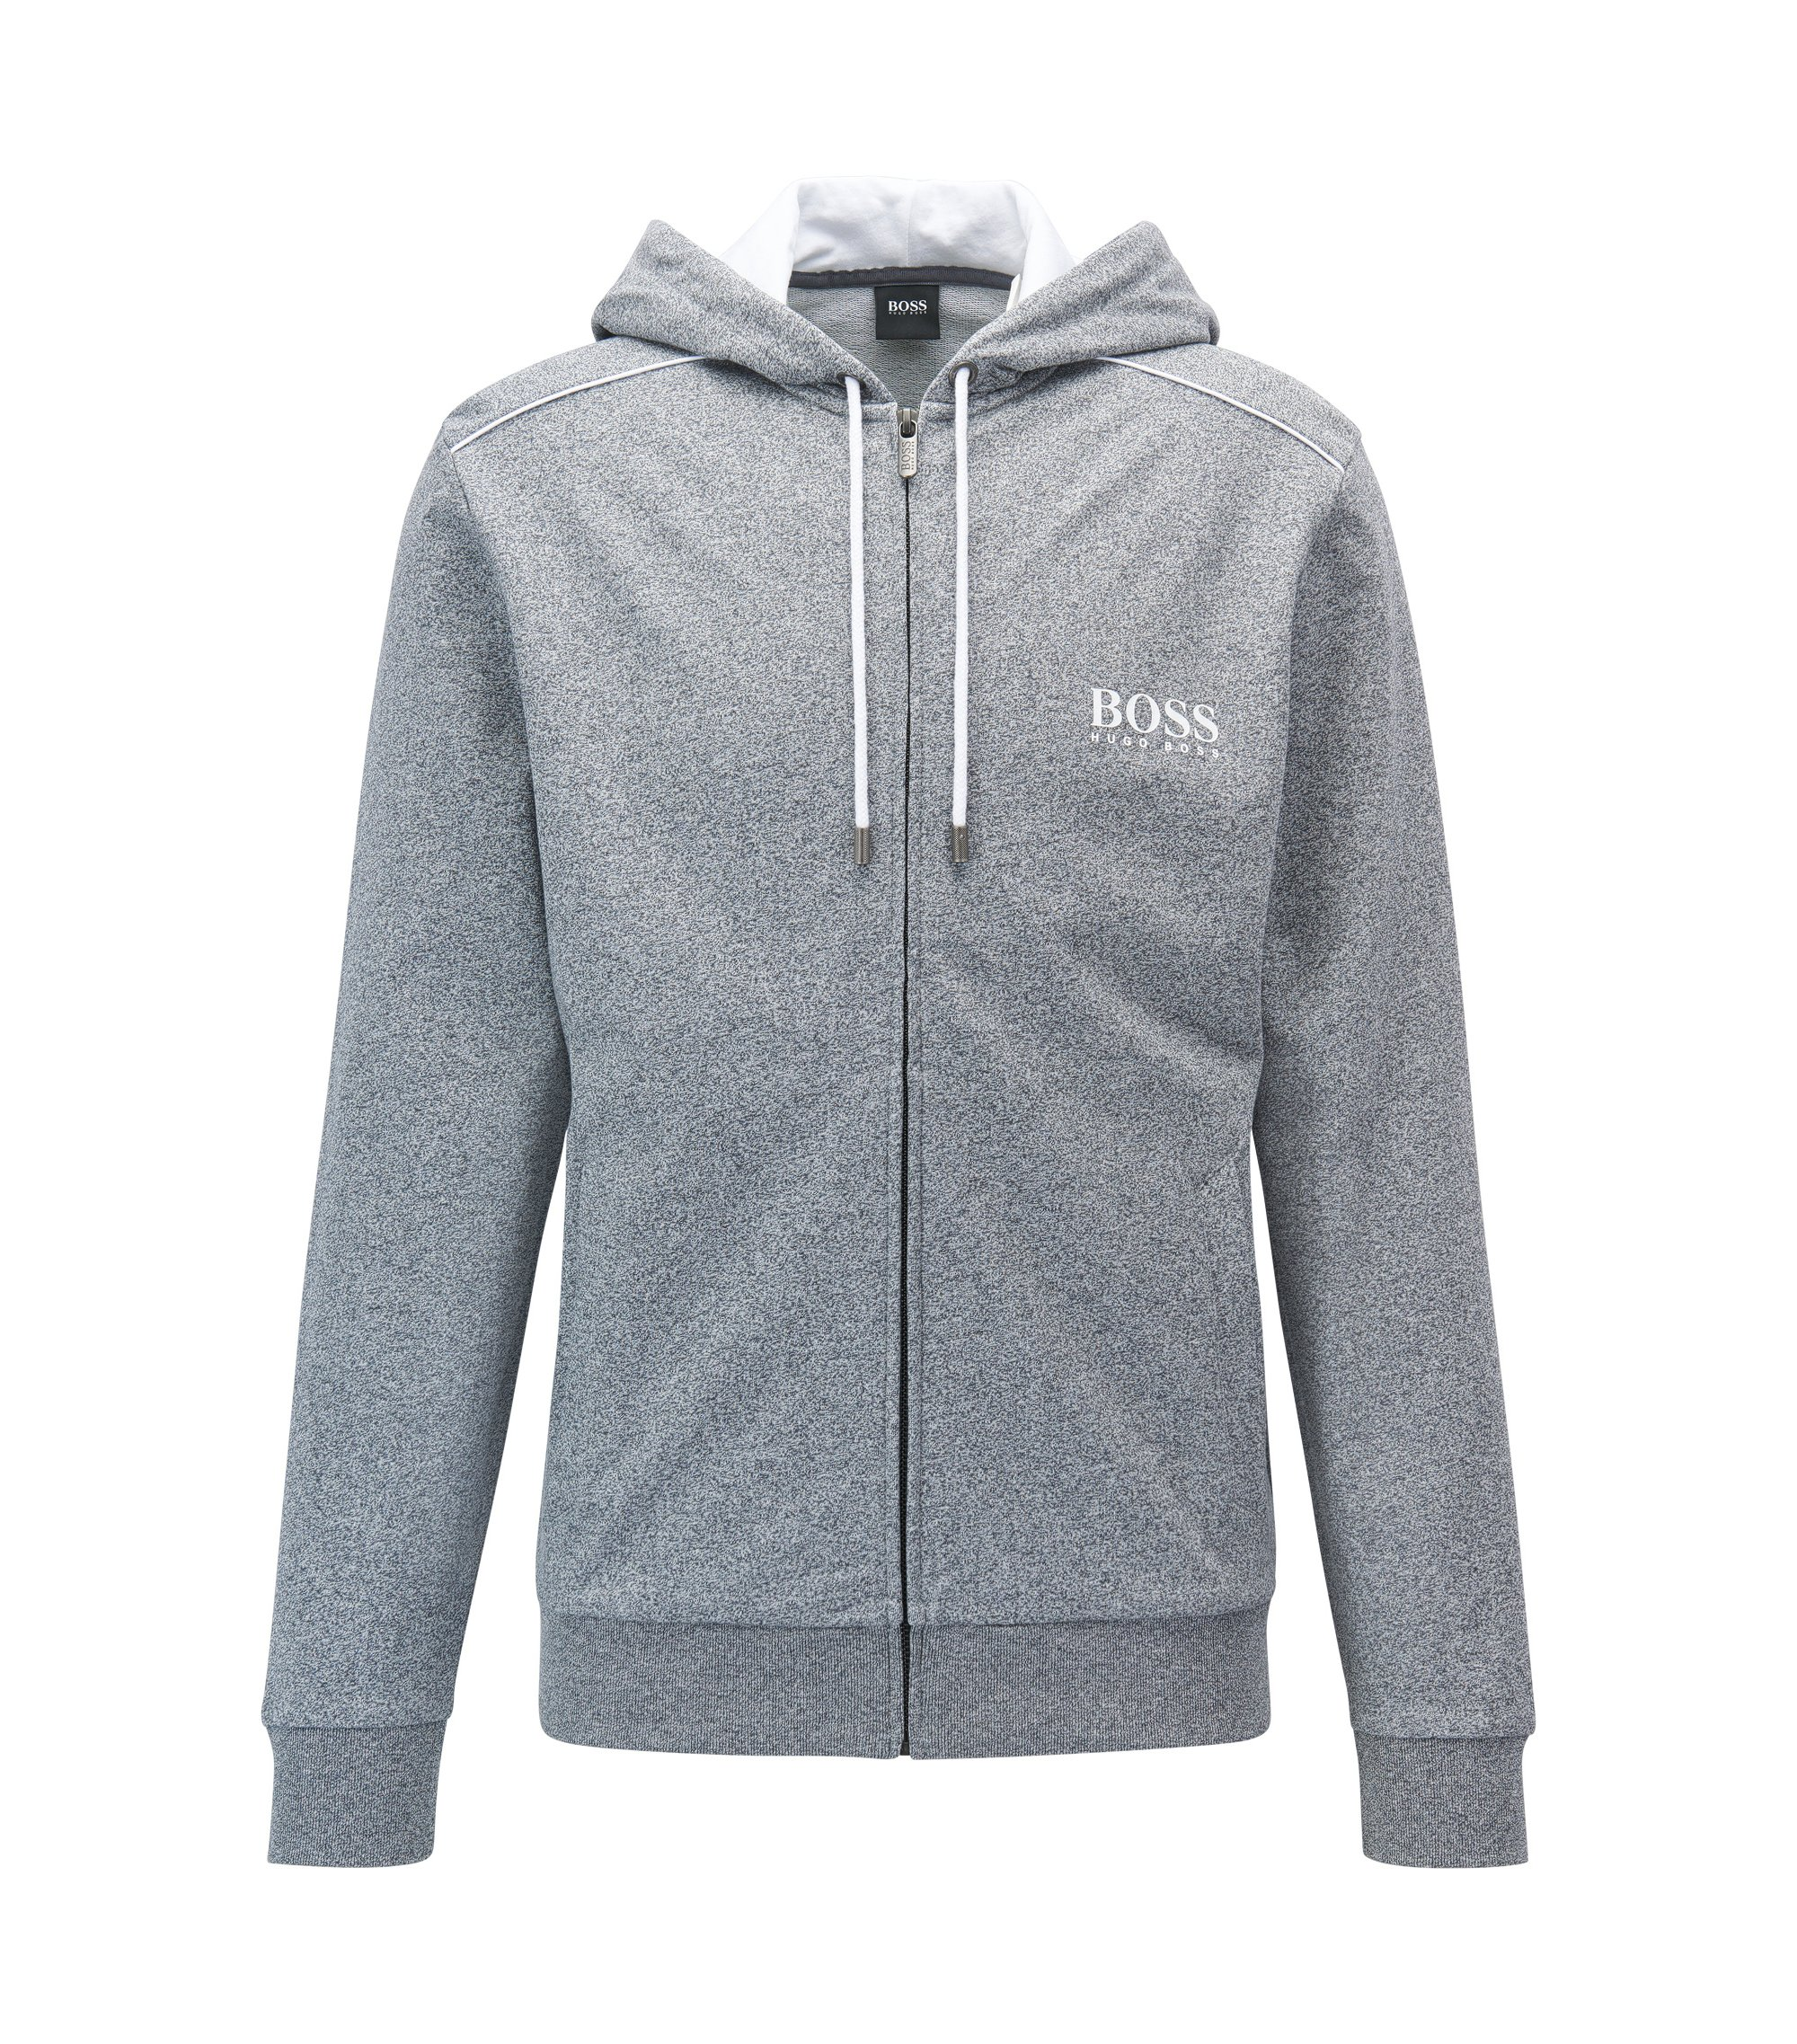 Heathered Cotton Hooded Sweat Jacket | Jacket Hooded, Charcoal